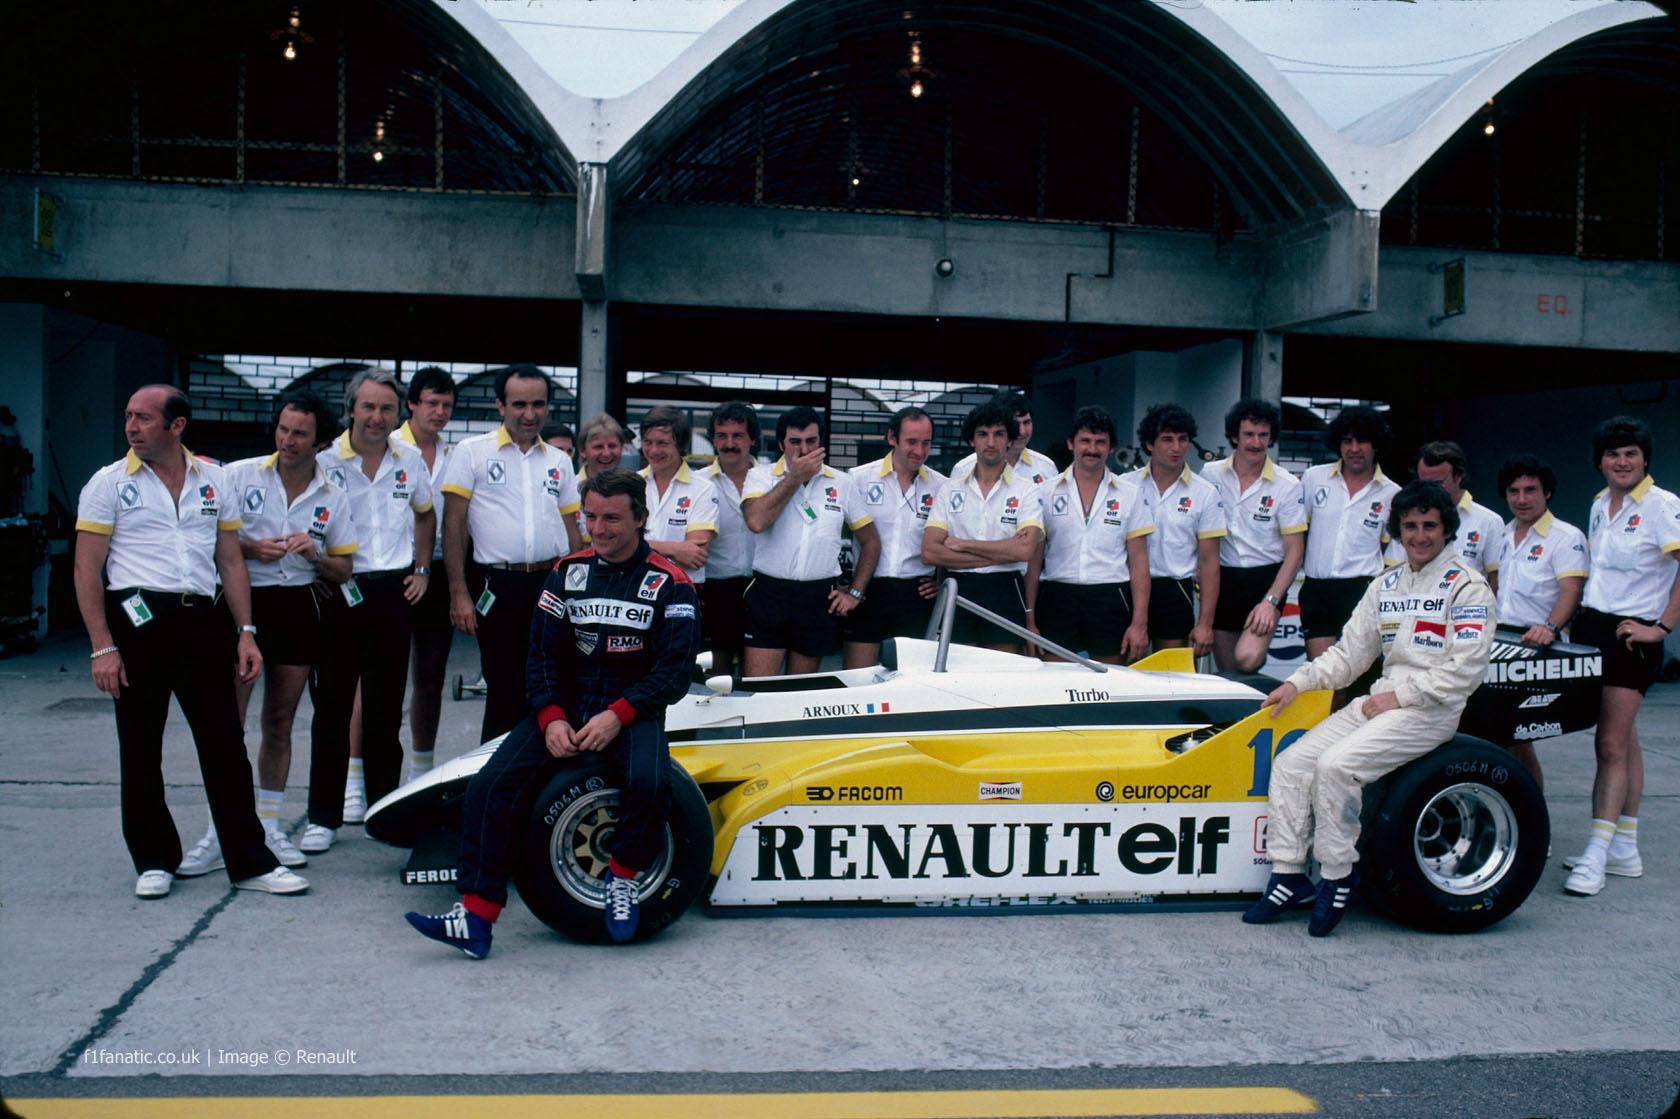 Rene Arnuox, Alain Prost, Renault, Monza, 1982